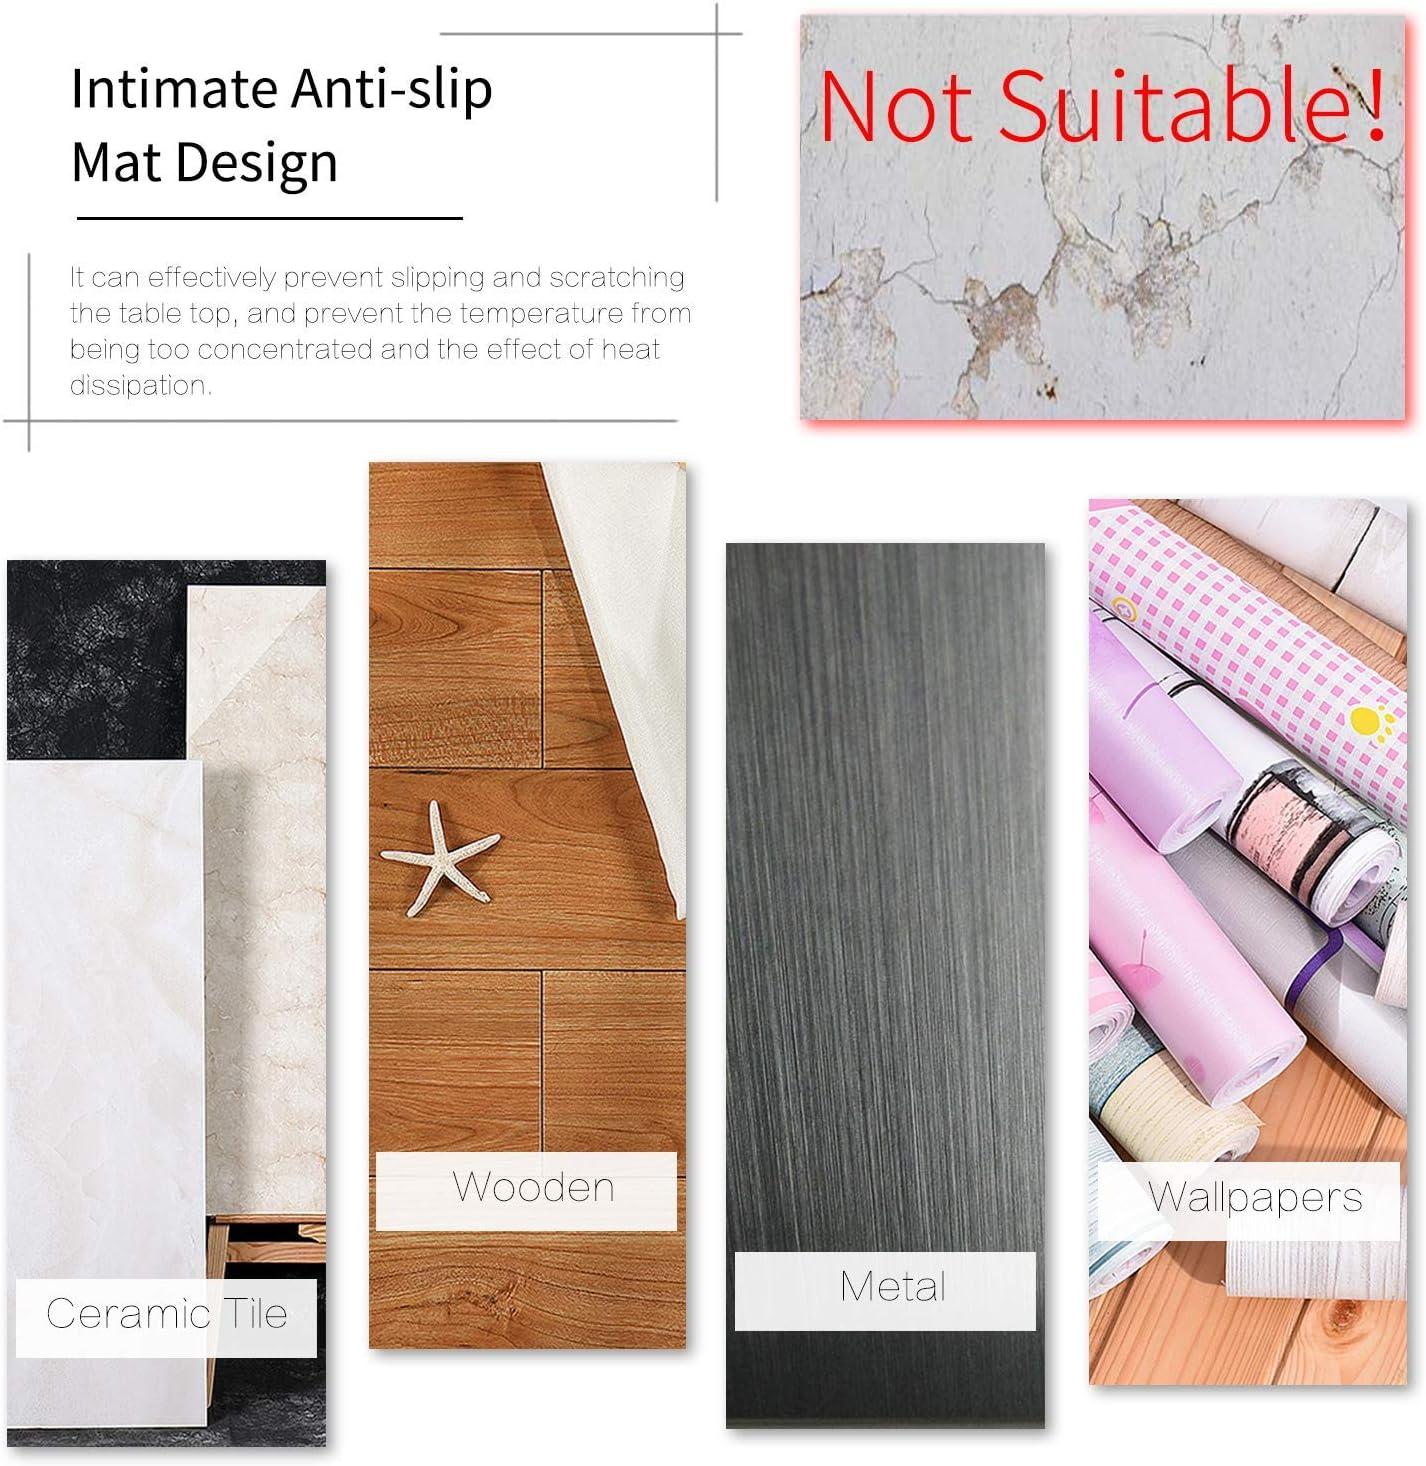 GrunCourt Silicon Wall Protectors Self Adhesive Door Stopper Door Handle Bumper Guard Stopper Rubber Stop White 5 Pcs